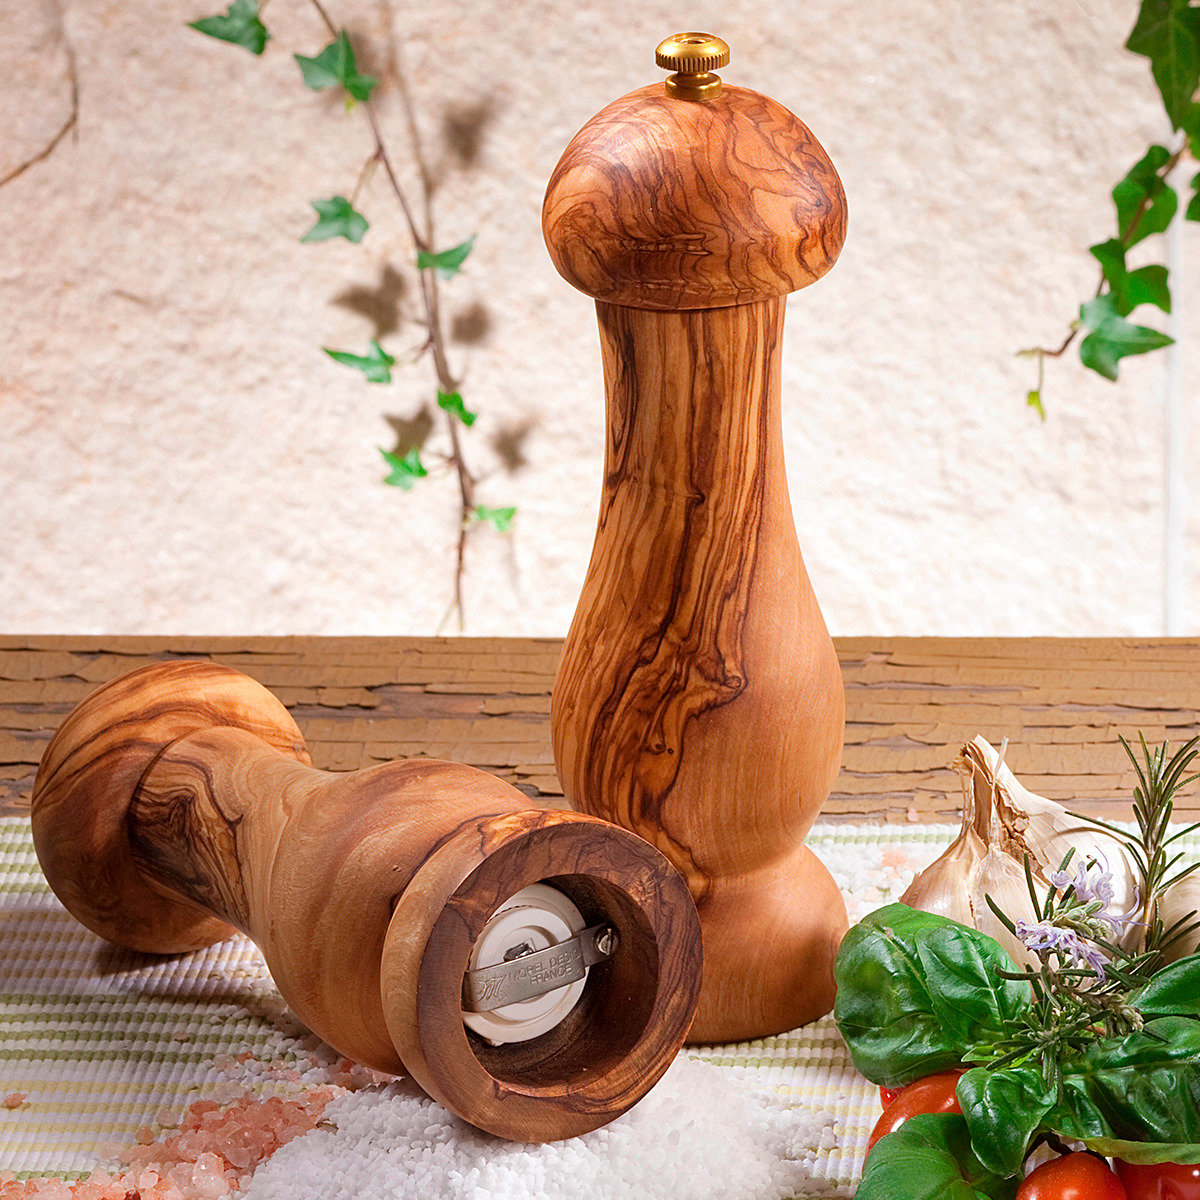 Olivenholz-Salzmühle mit Keramik-Mahlwerk